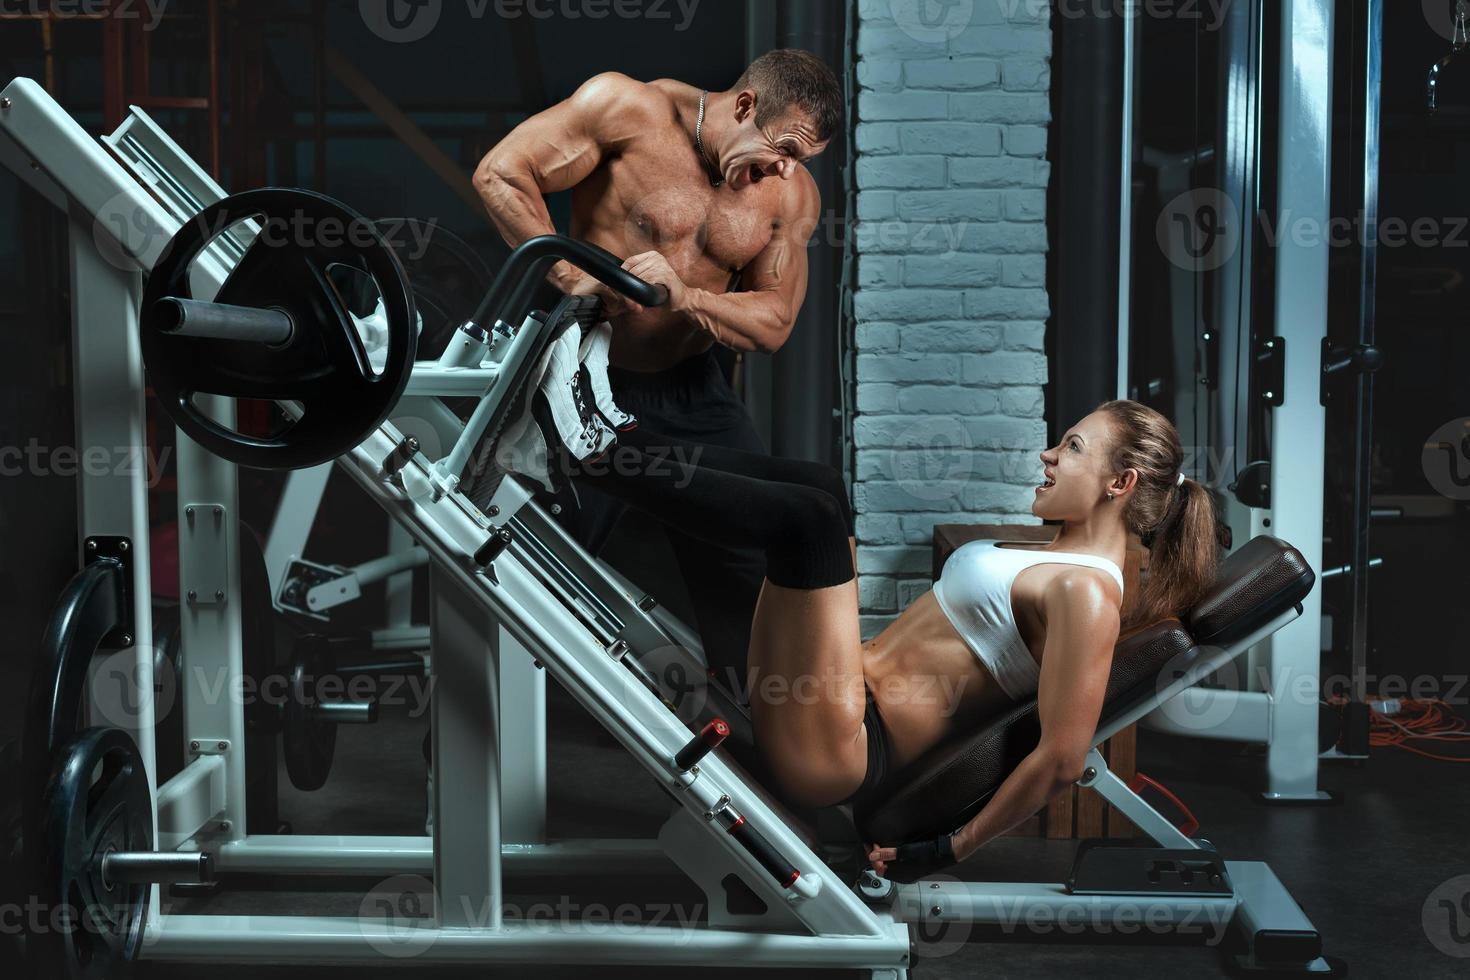 bodybuilder homme forme une femme. photo